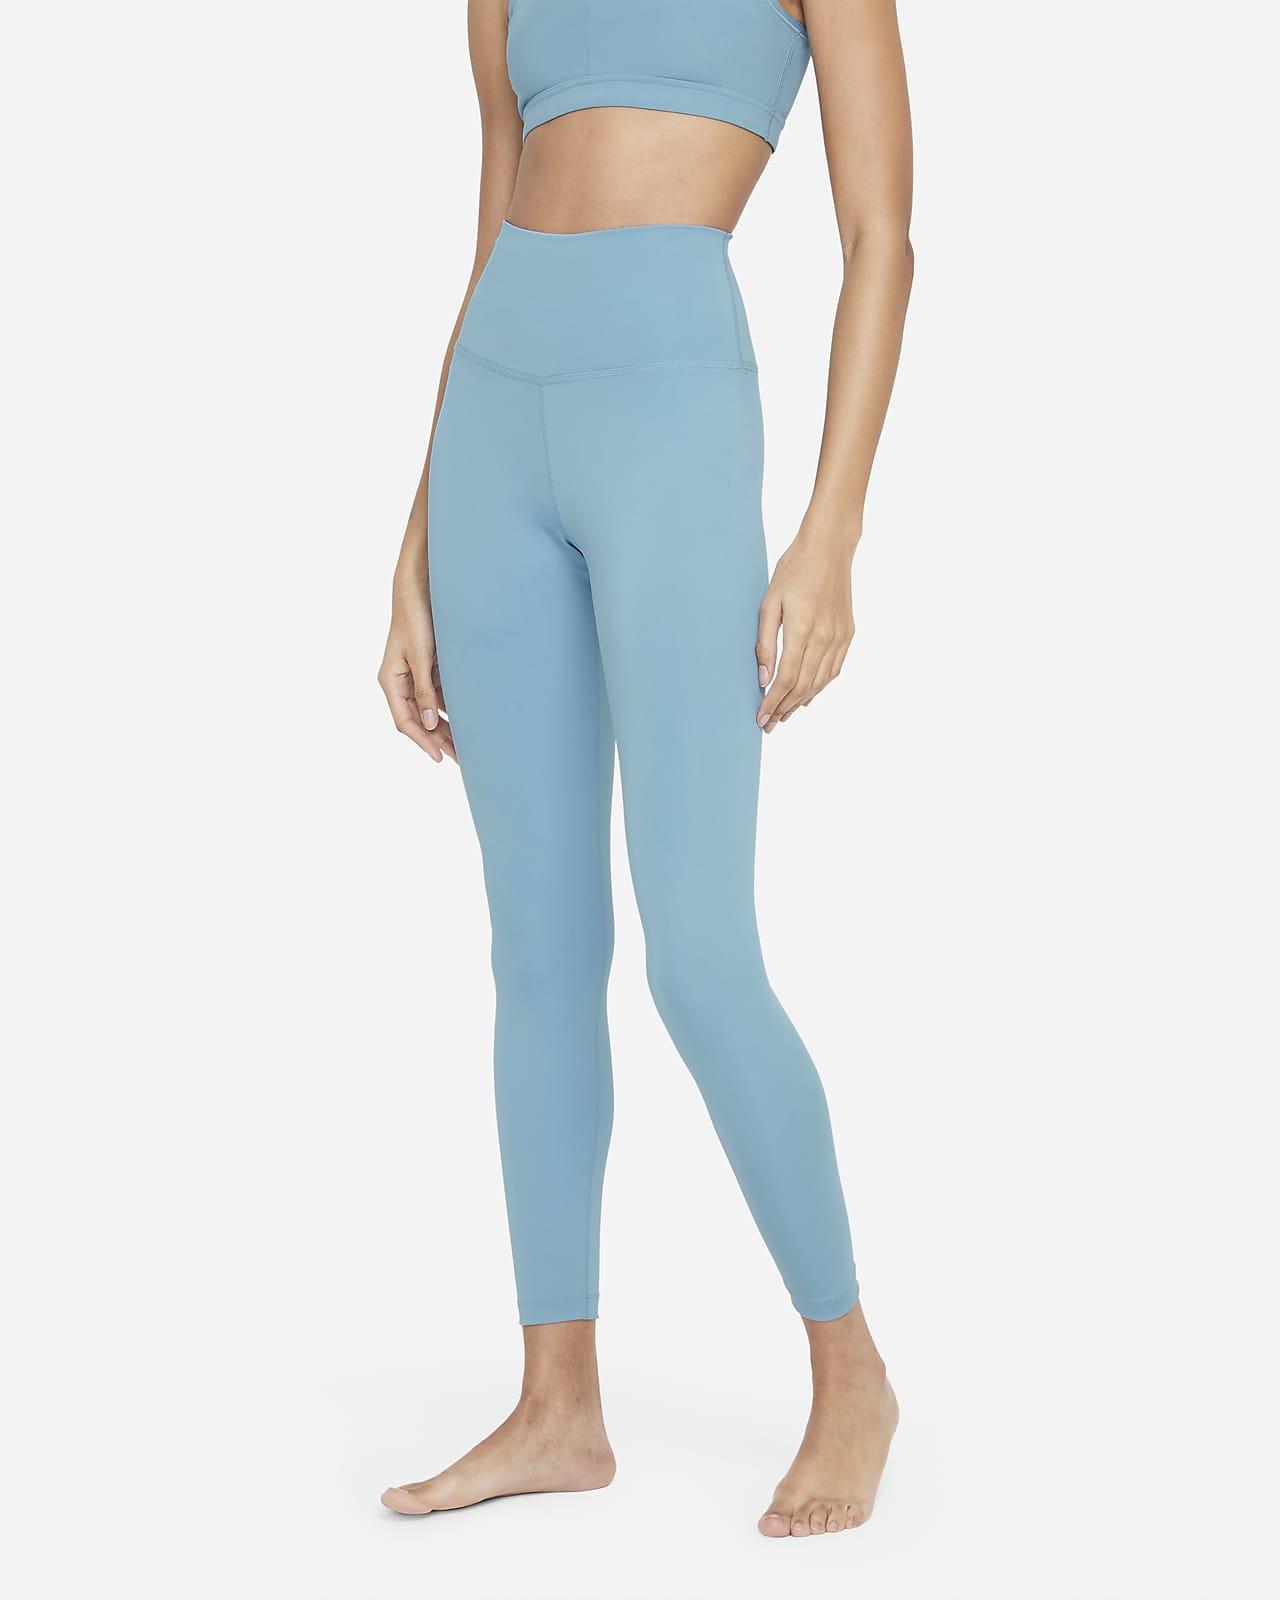 Legging 7/8 taille haute Nike Yoga pour Femme